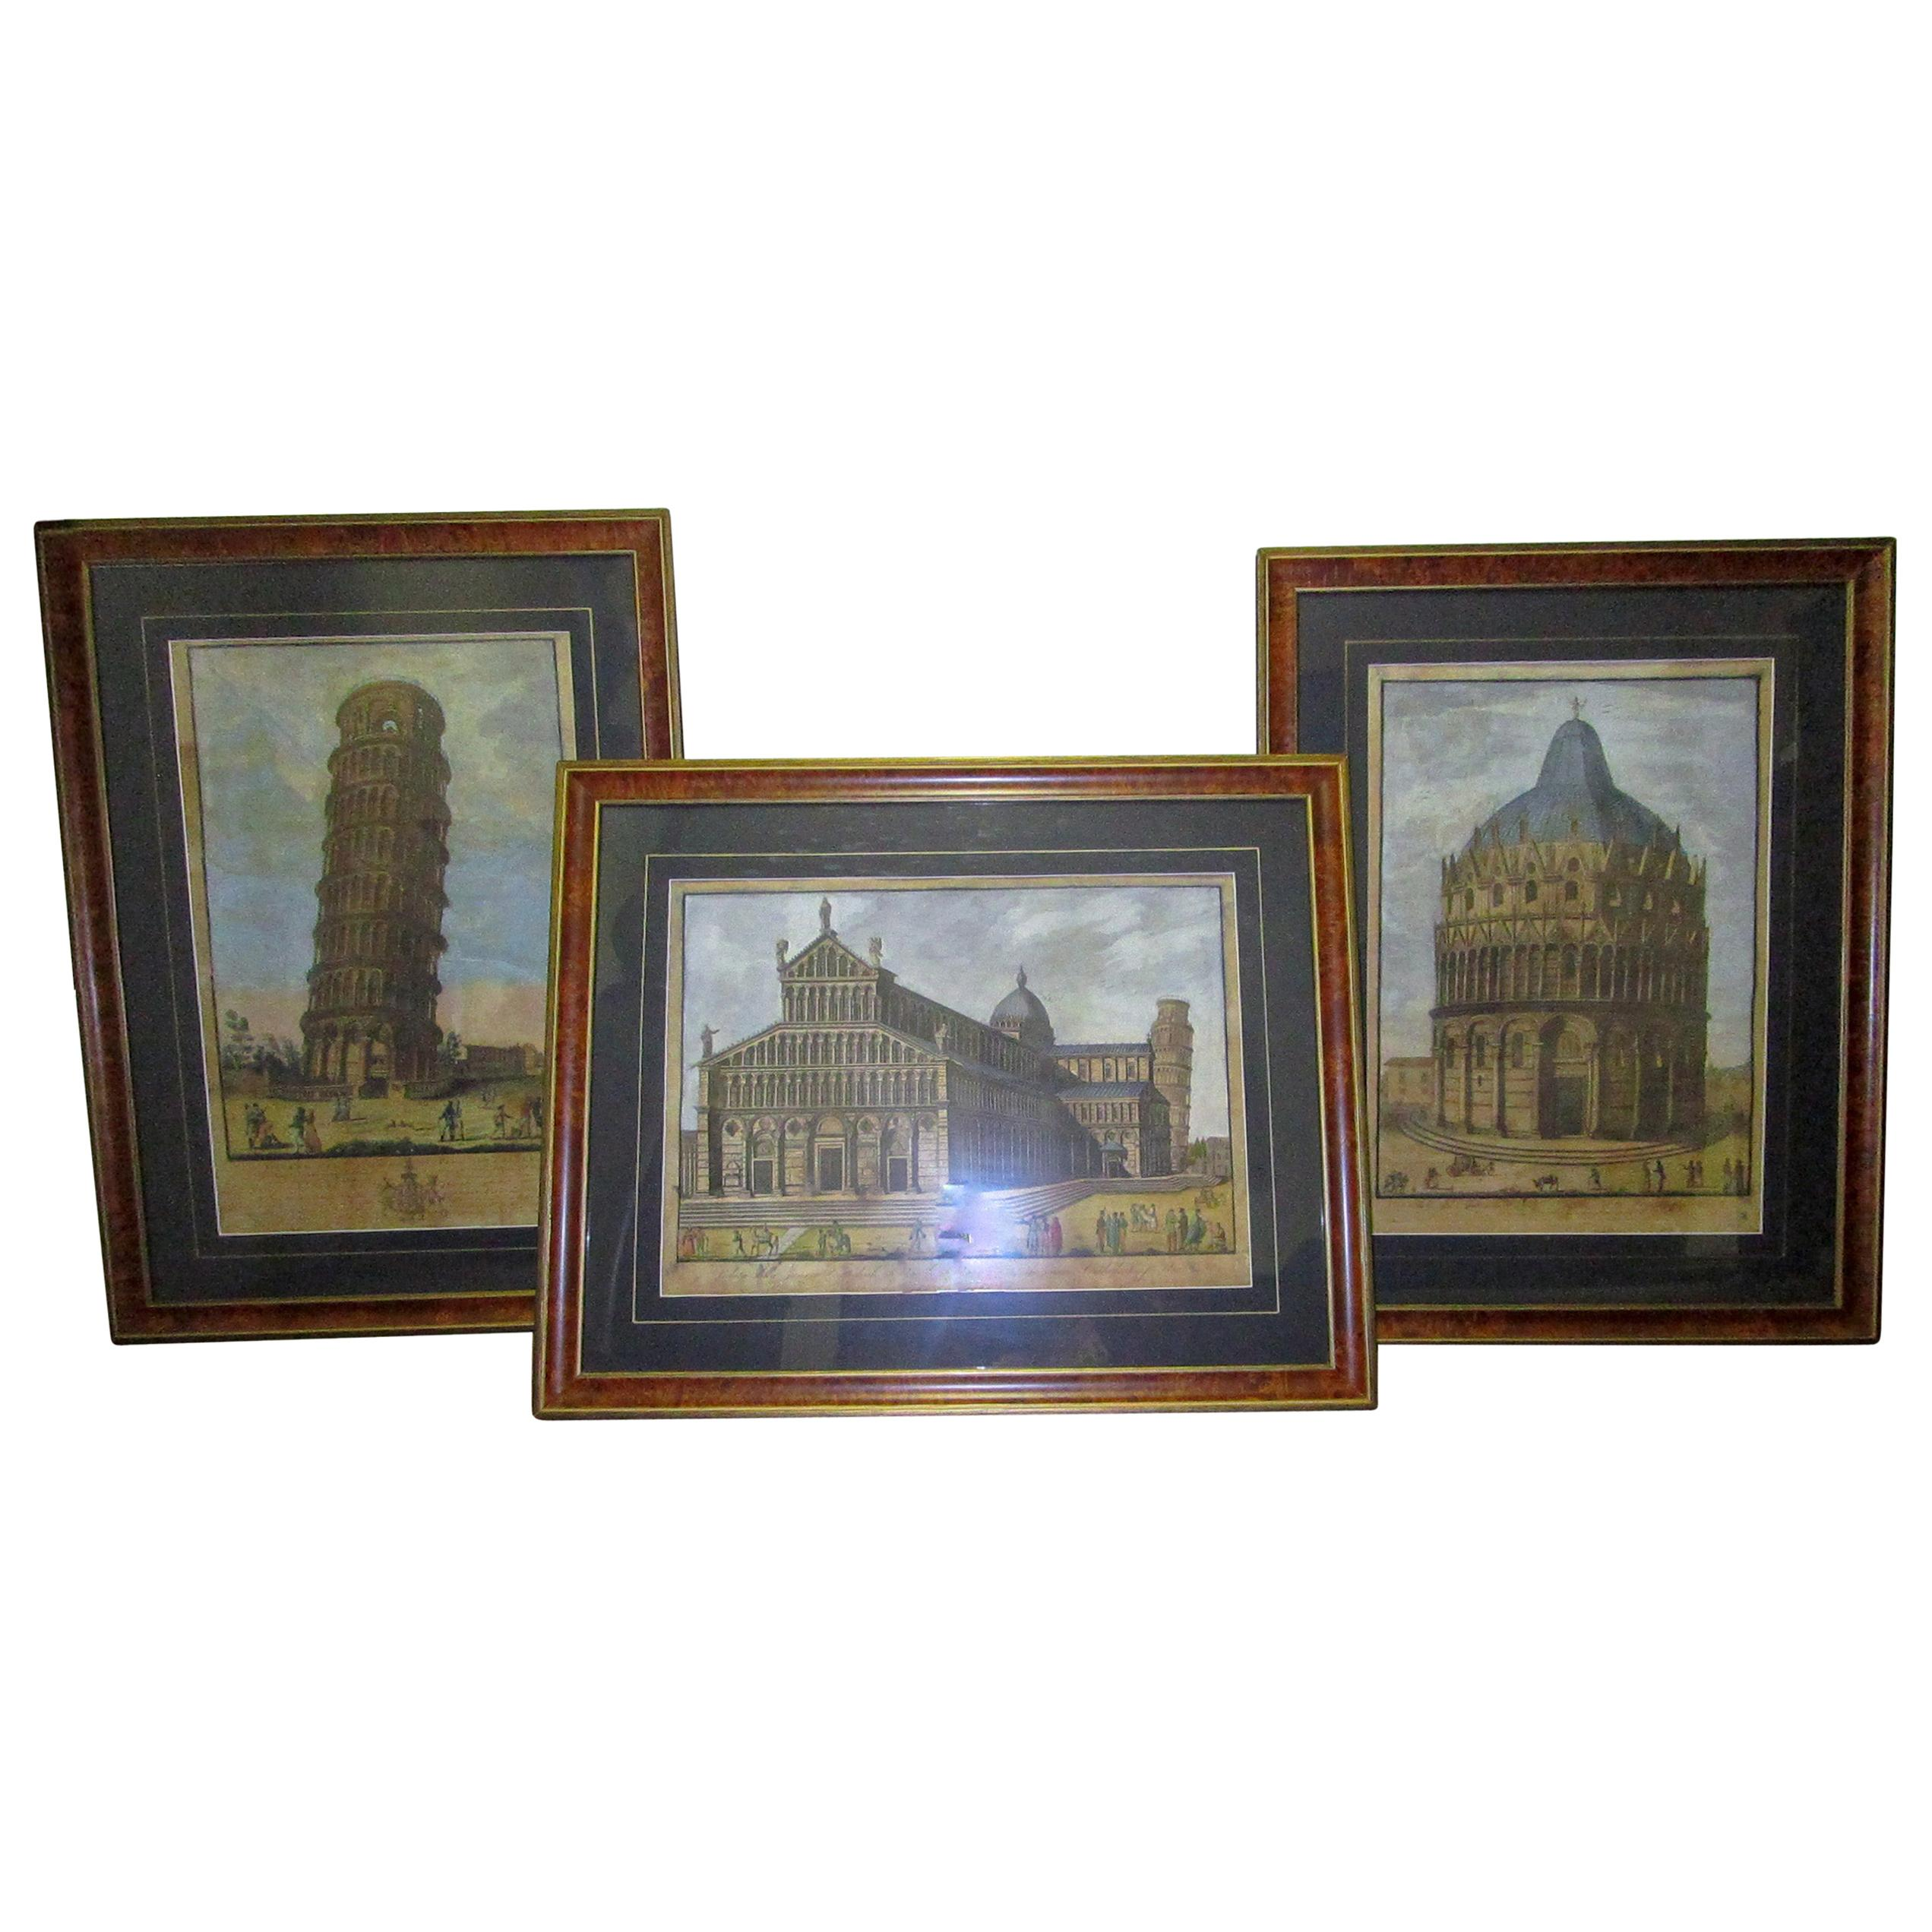 19th Century Framed Italian Prints of Pisa by Engraver Antonio Verico